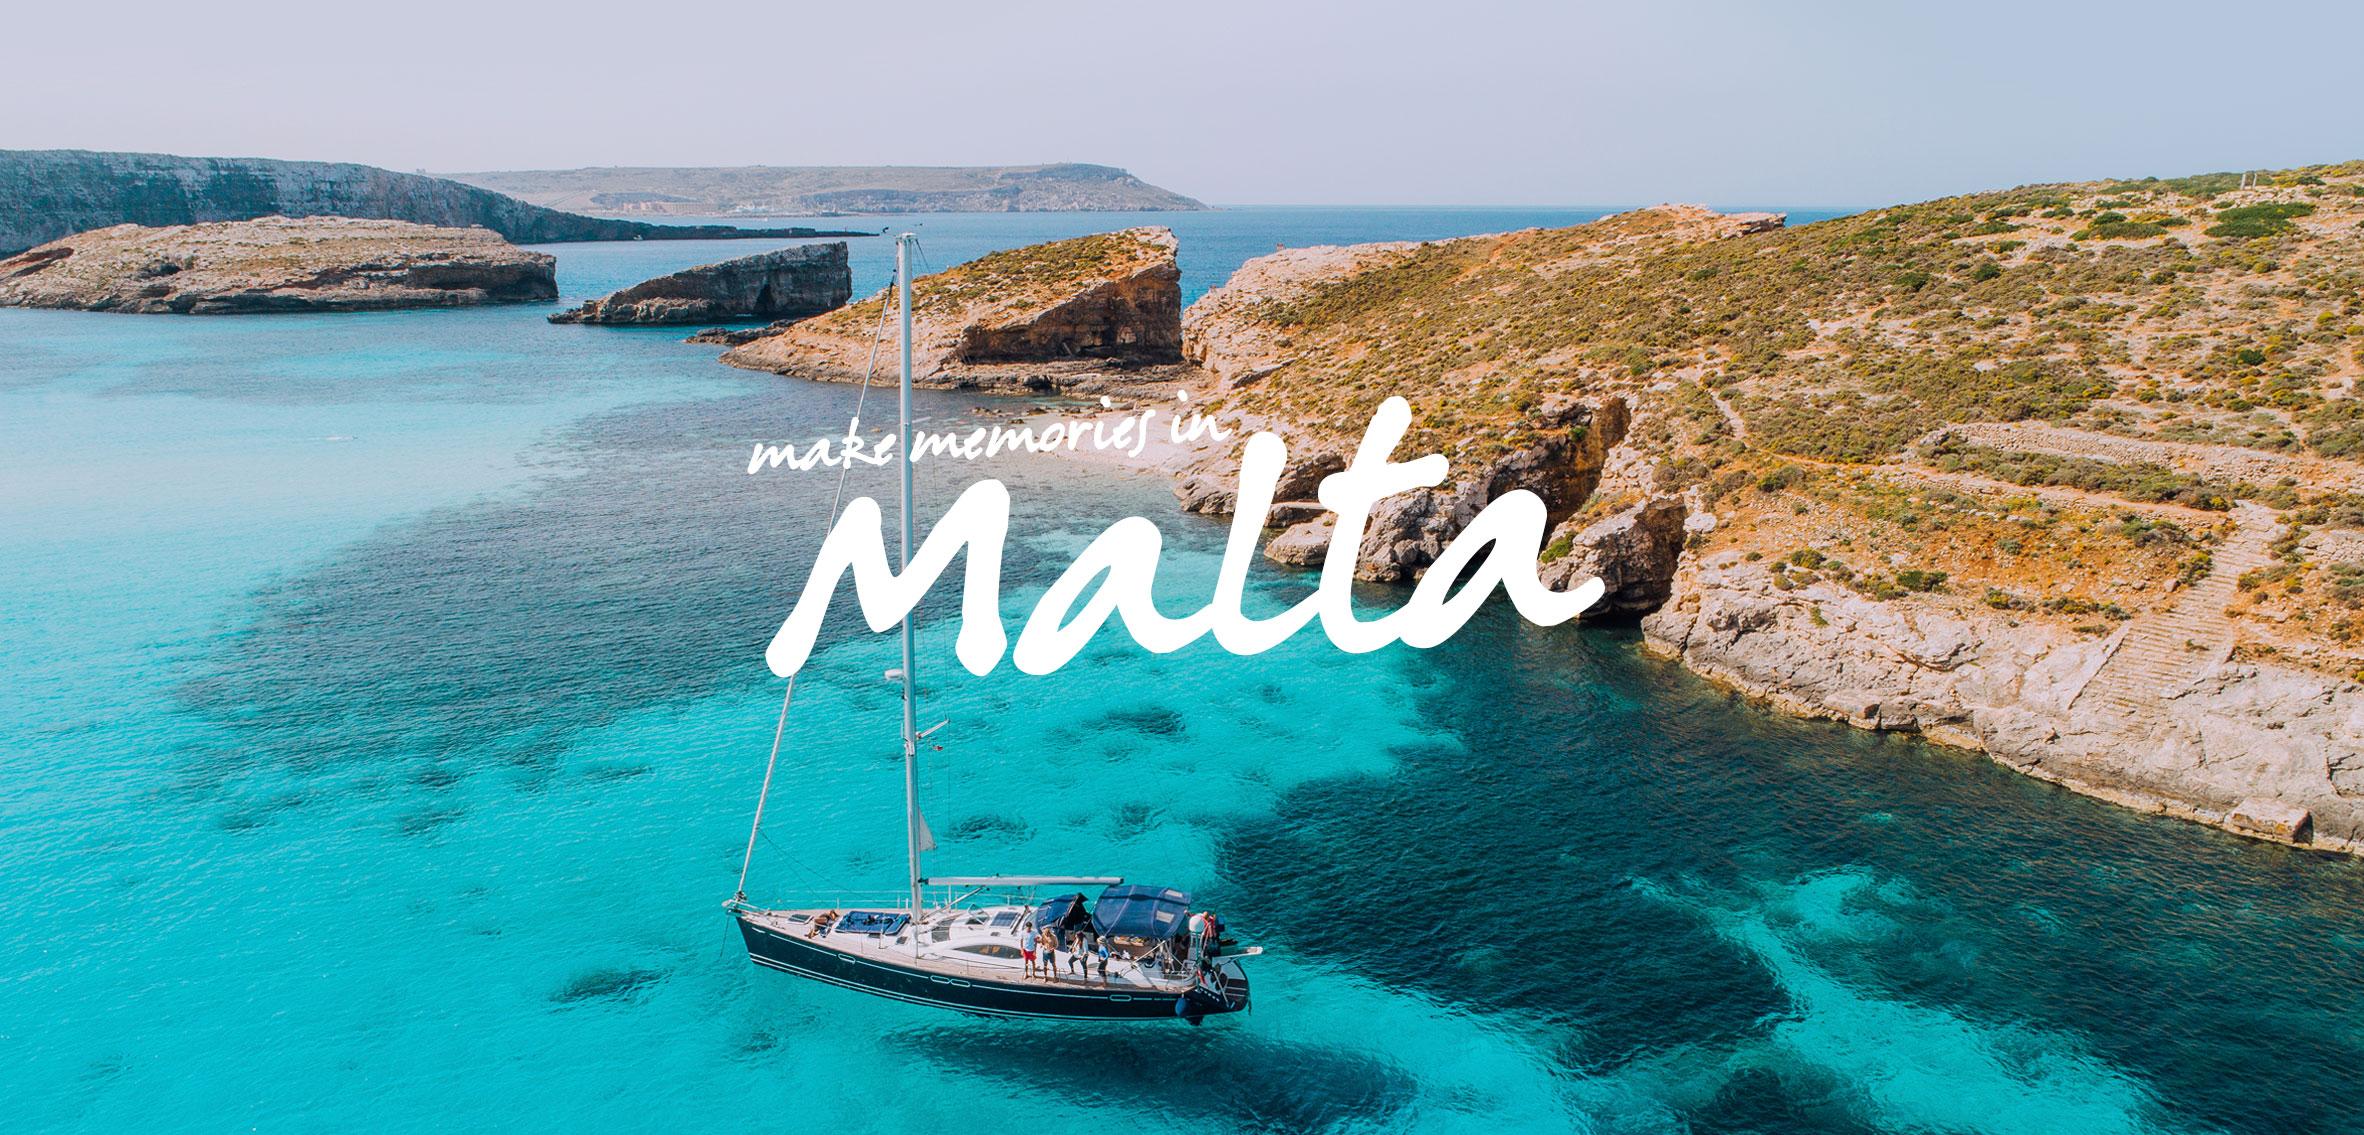 Malta ad ognissanti 1 novembre vagabondo - Malta a novembre bagno ...